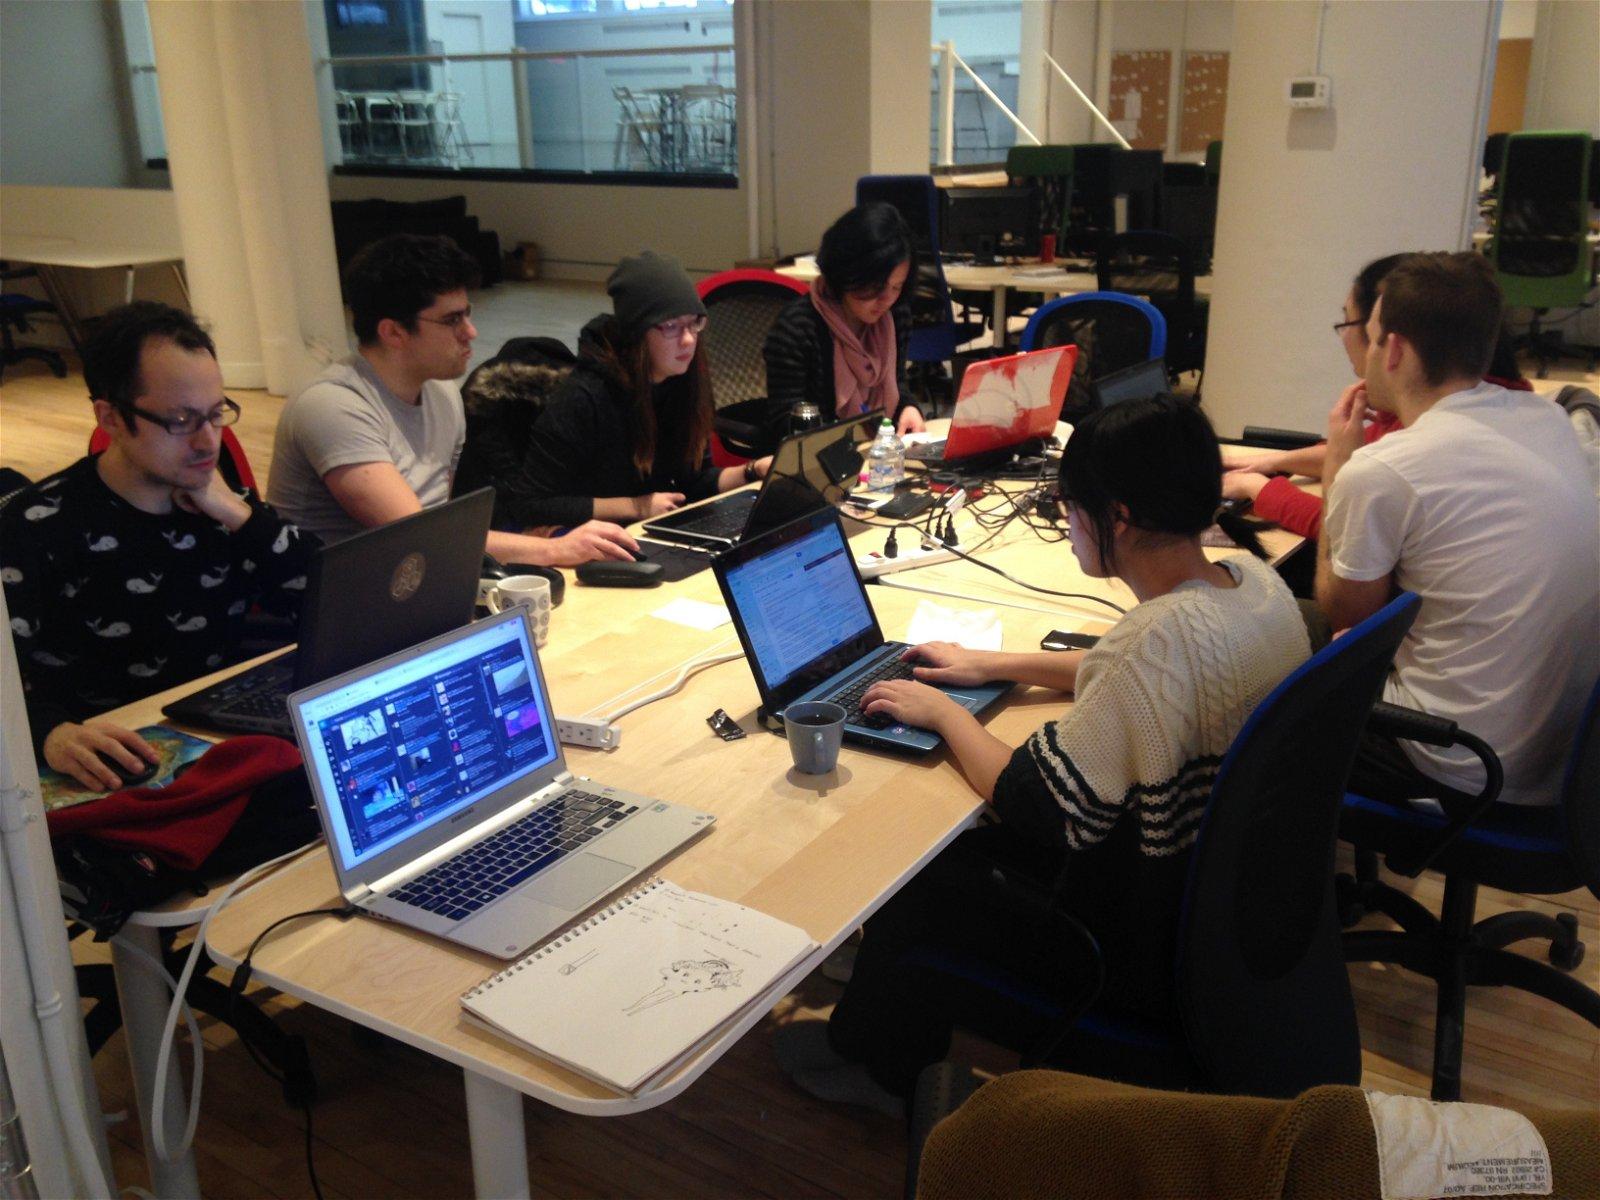 Pixelles